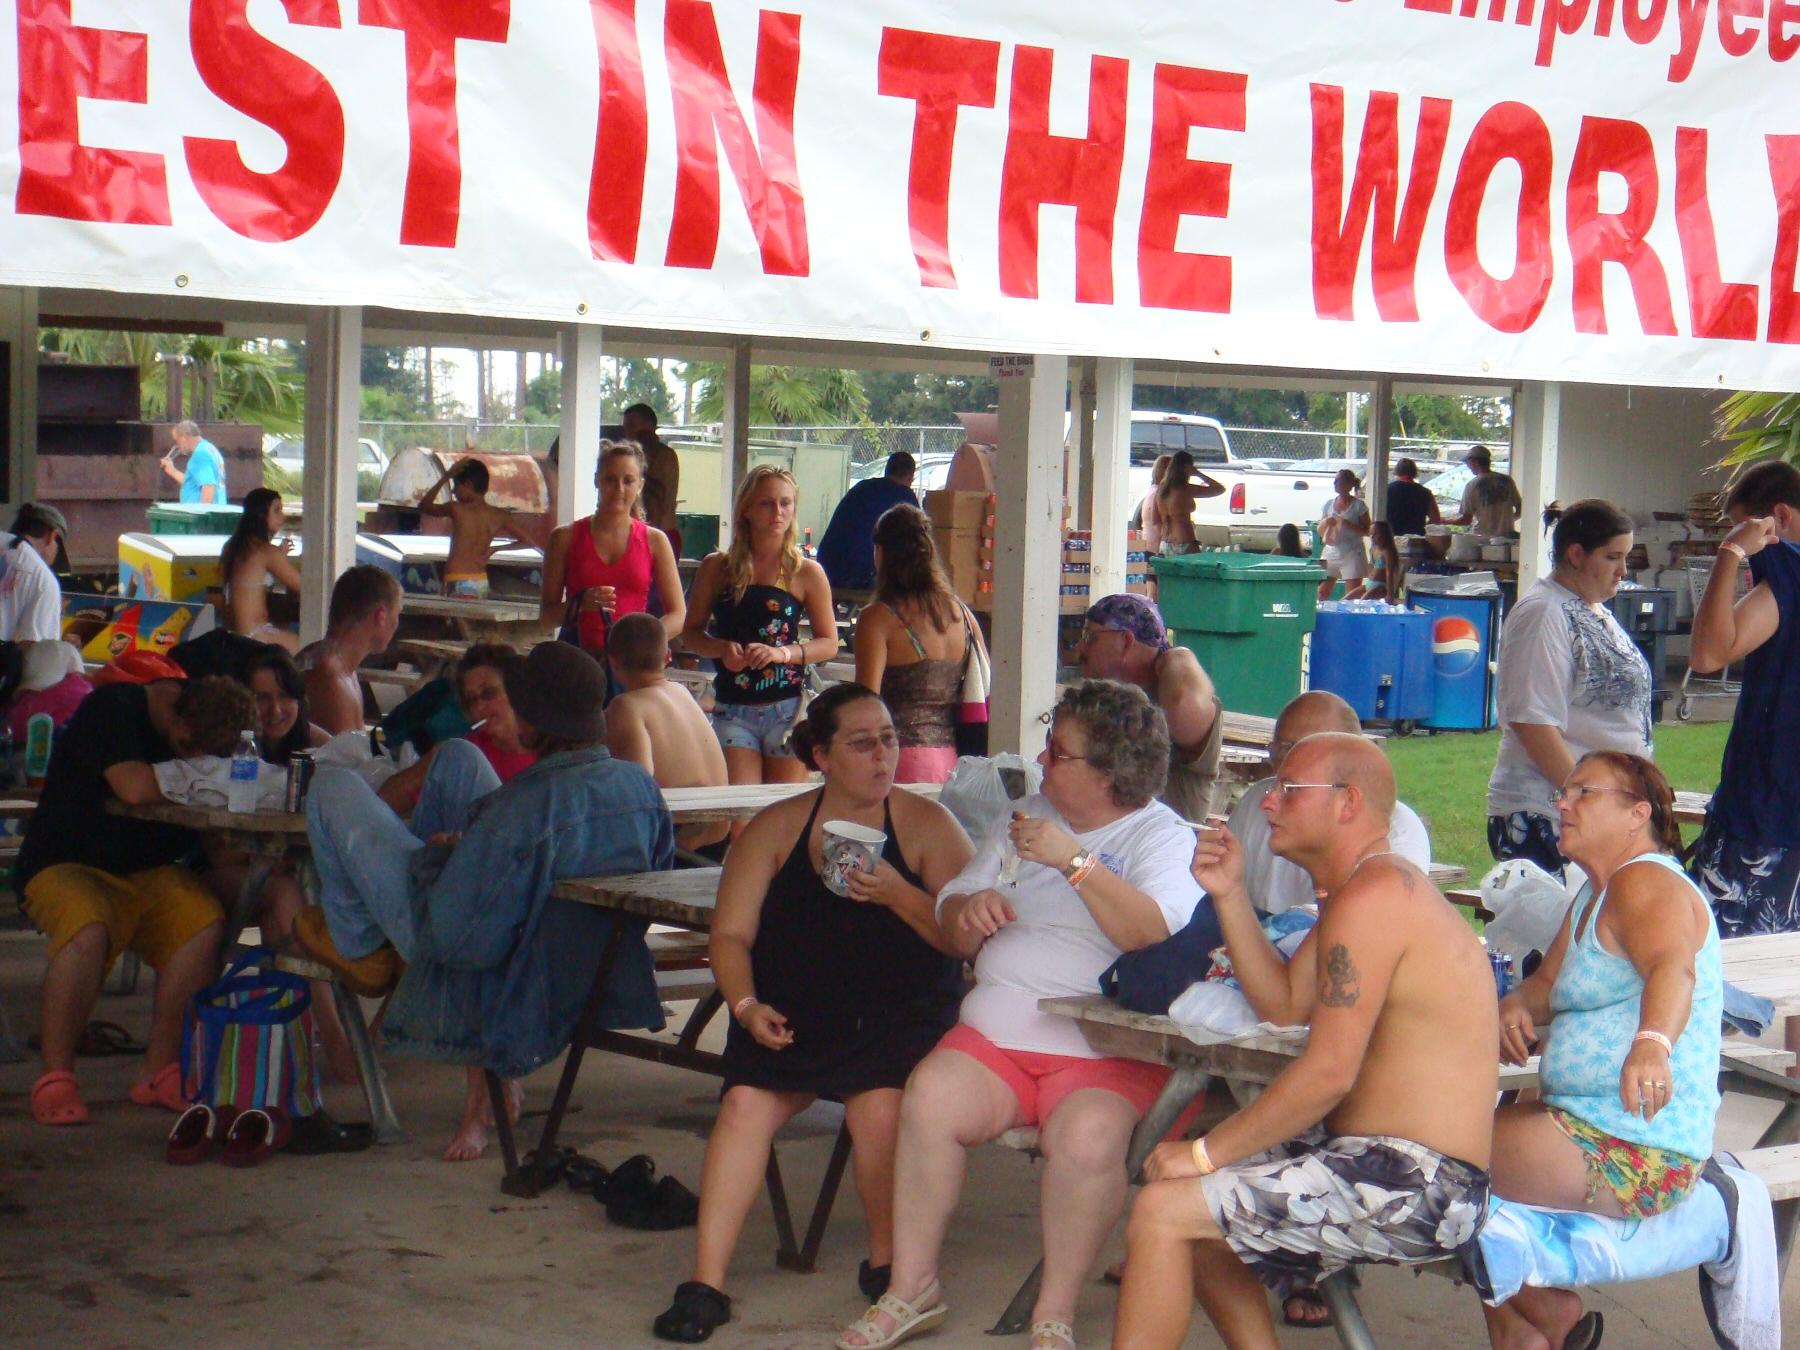 OOH employees at picnic